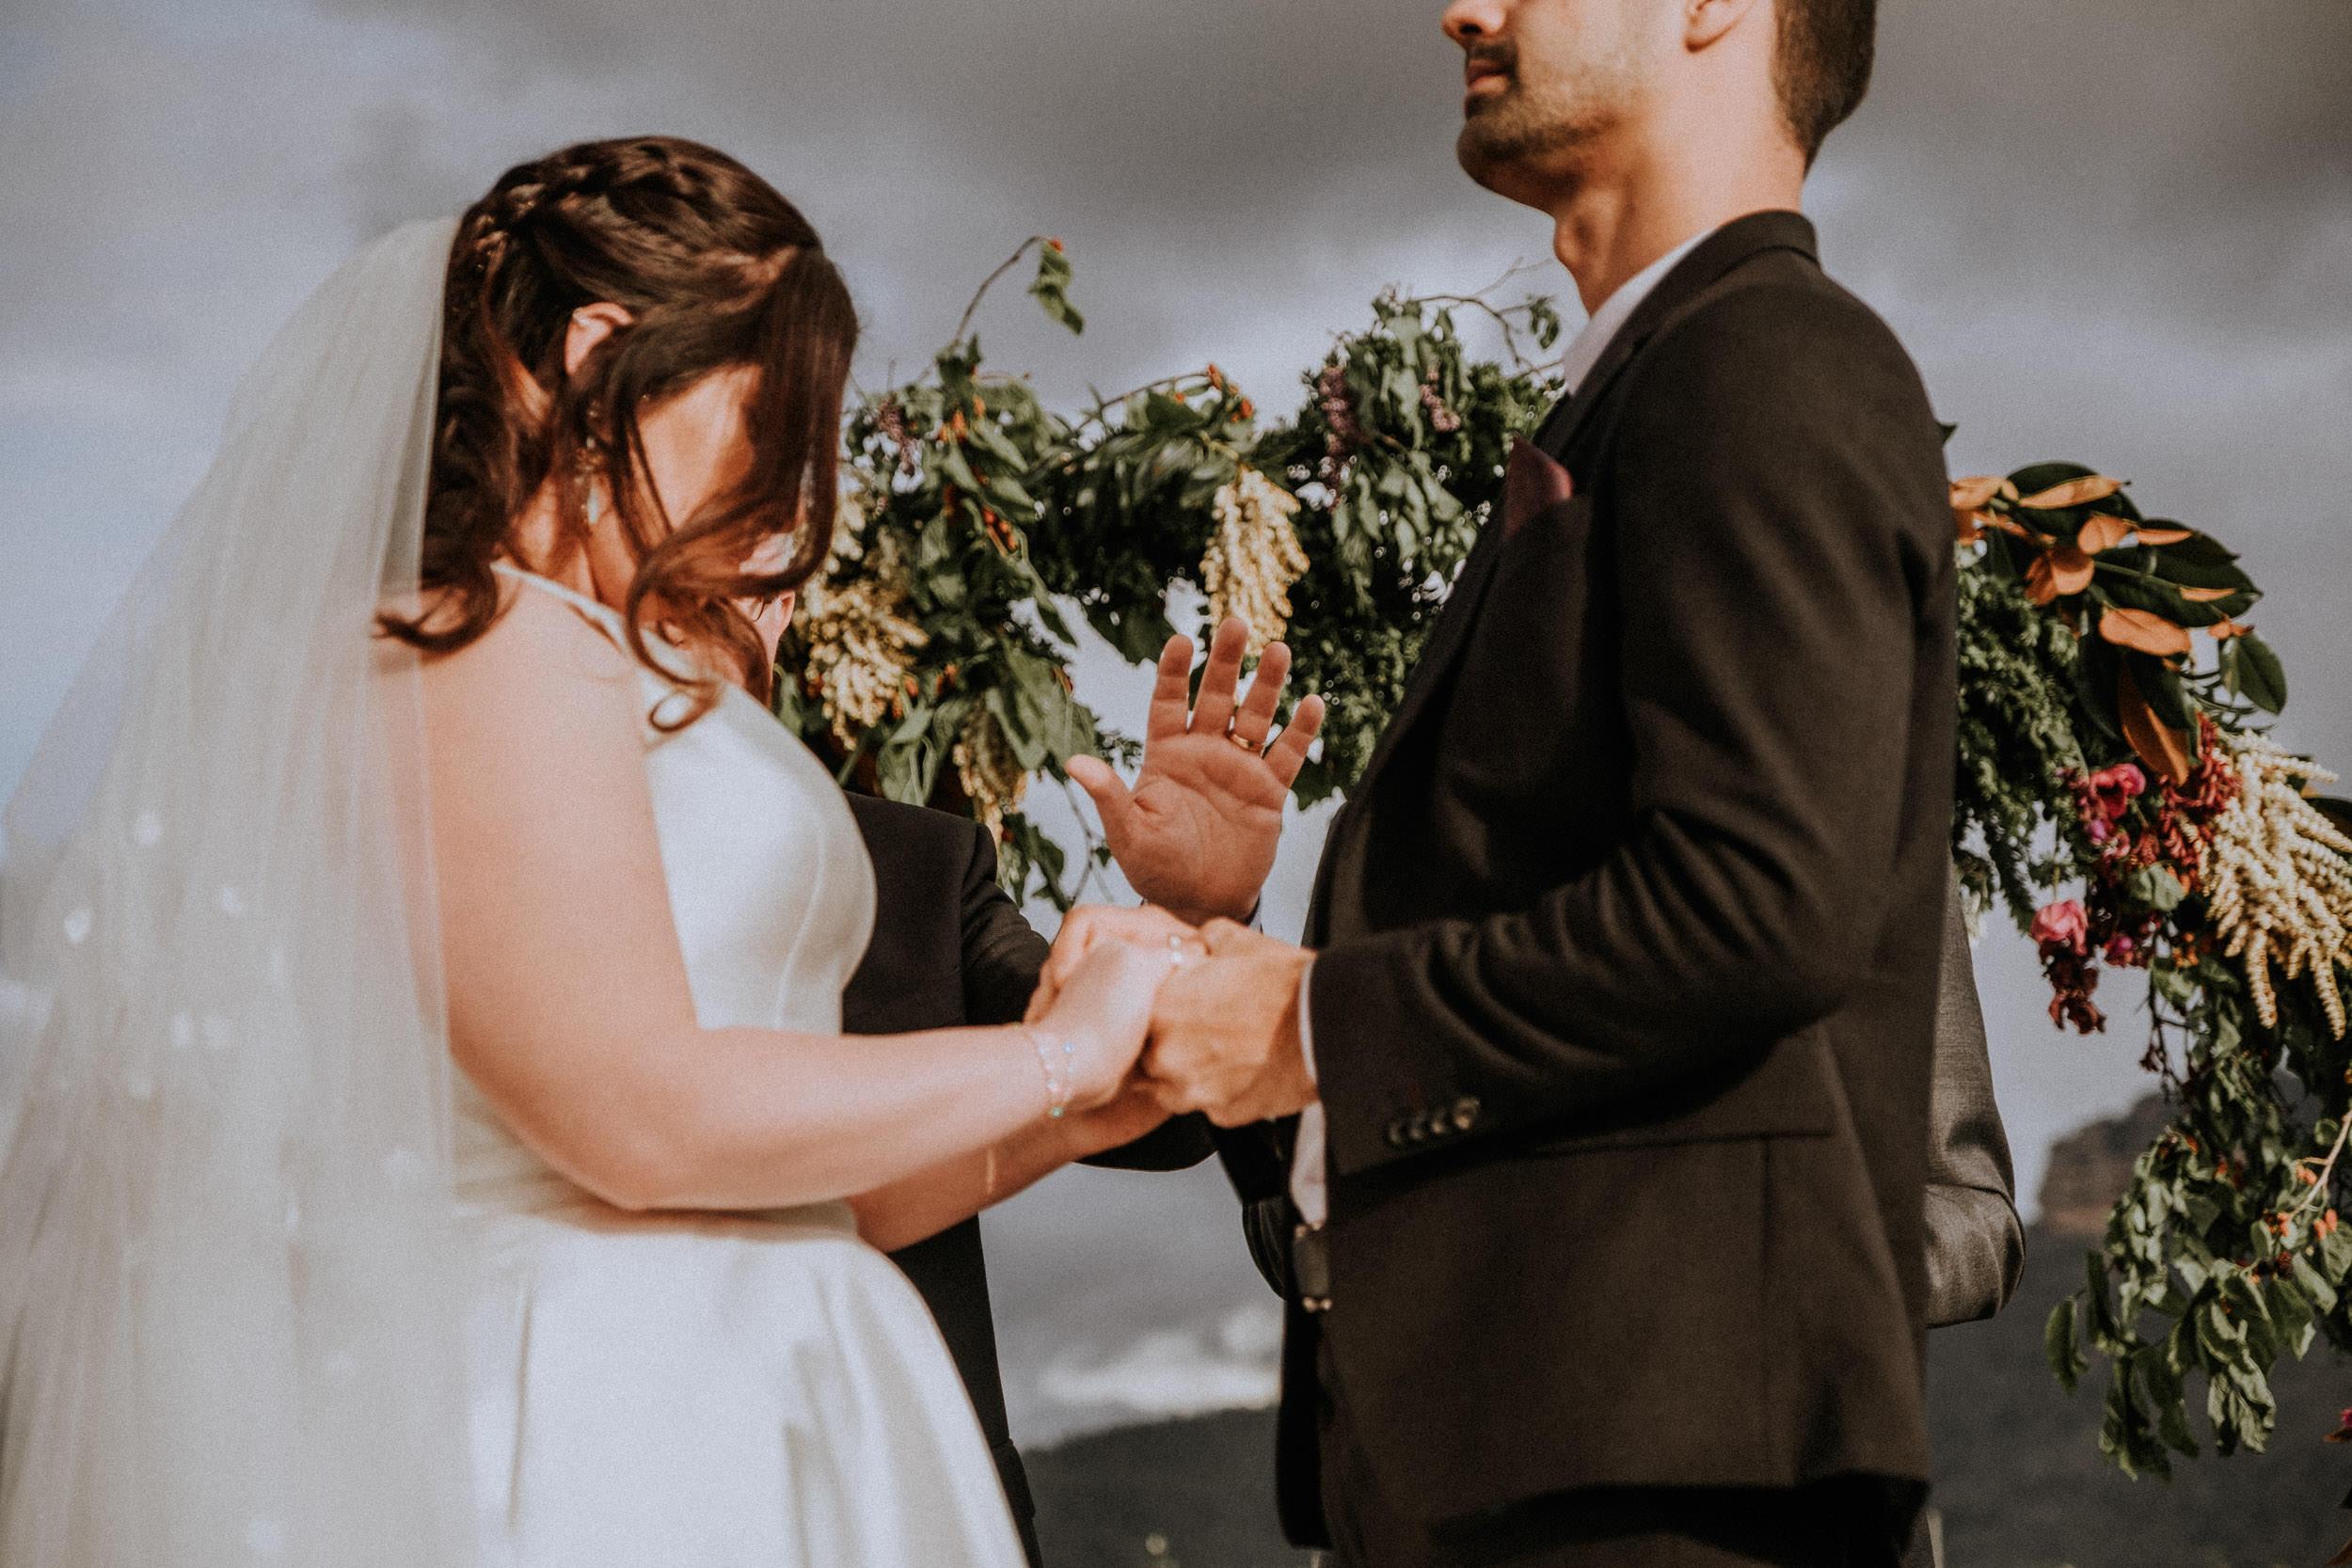 s+j_top_elopement wedding photography_kings & thieves_blog - 230.jpg